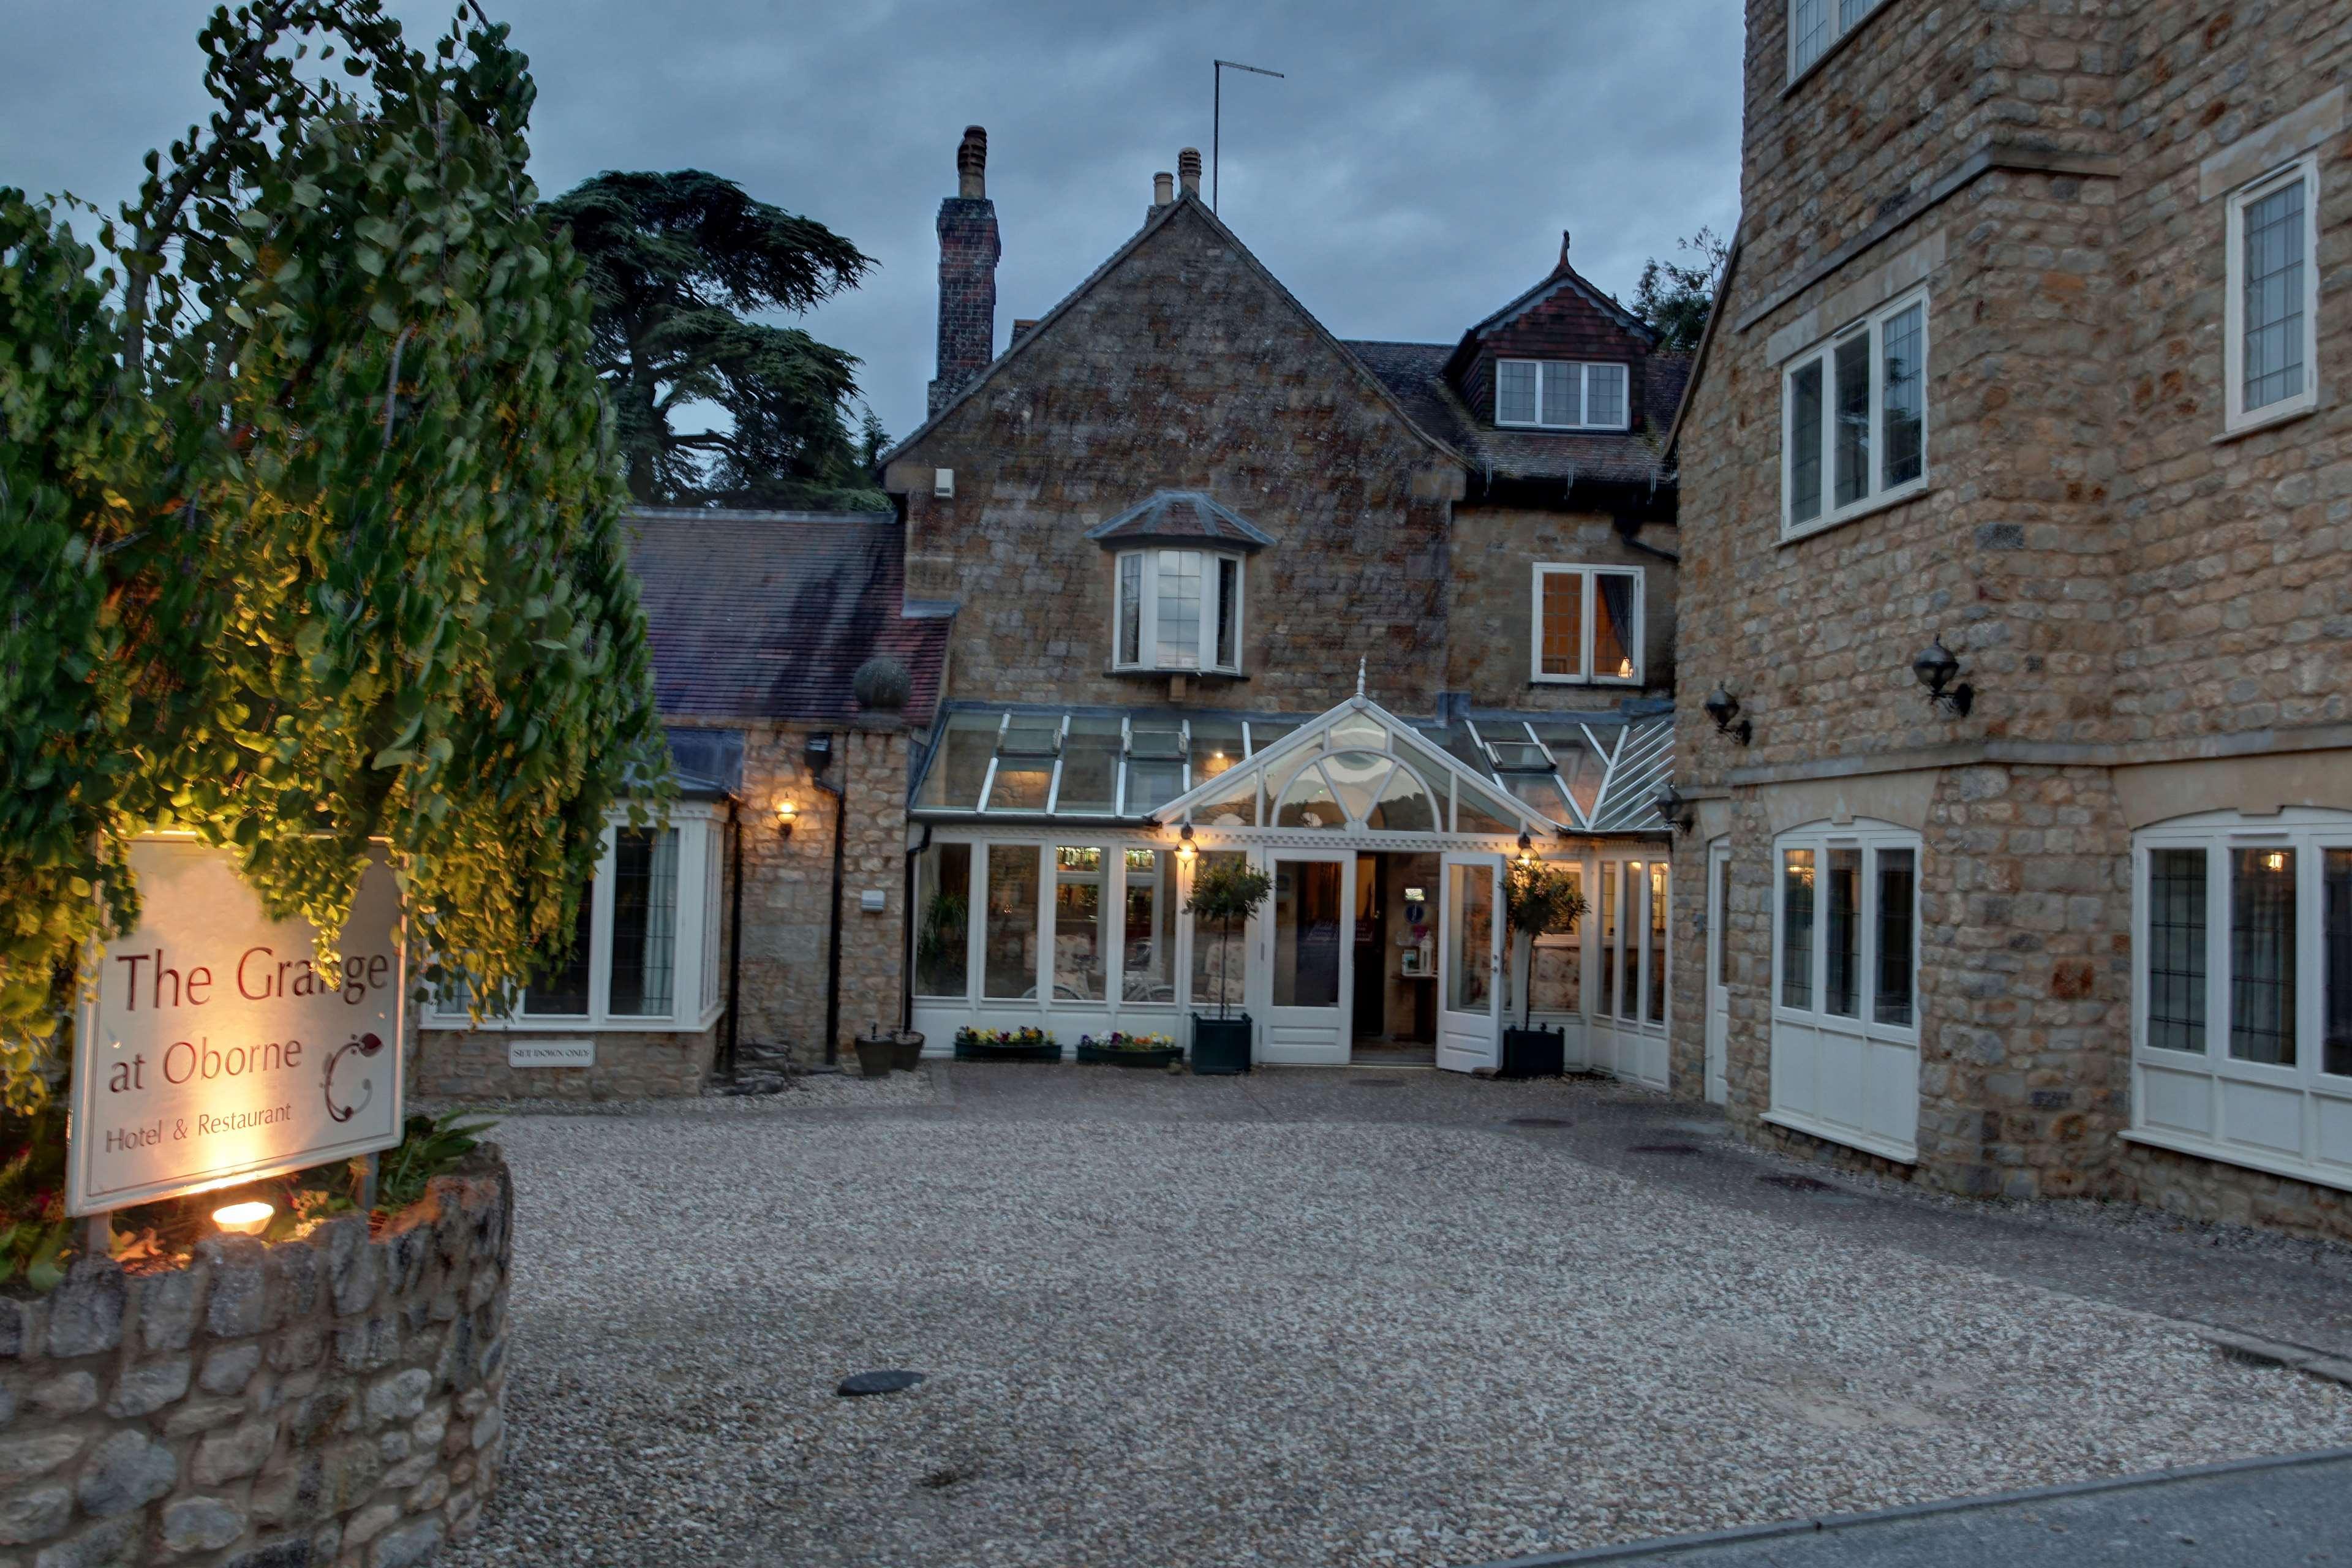 Best Western The Grange at Oborne, Dorset